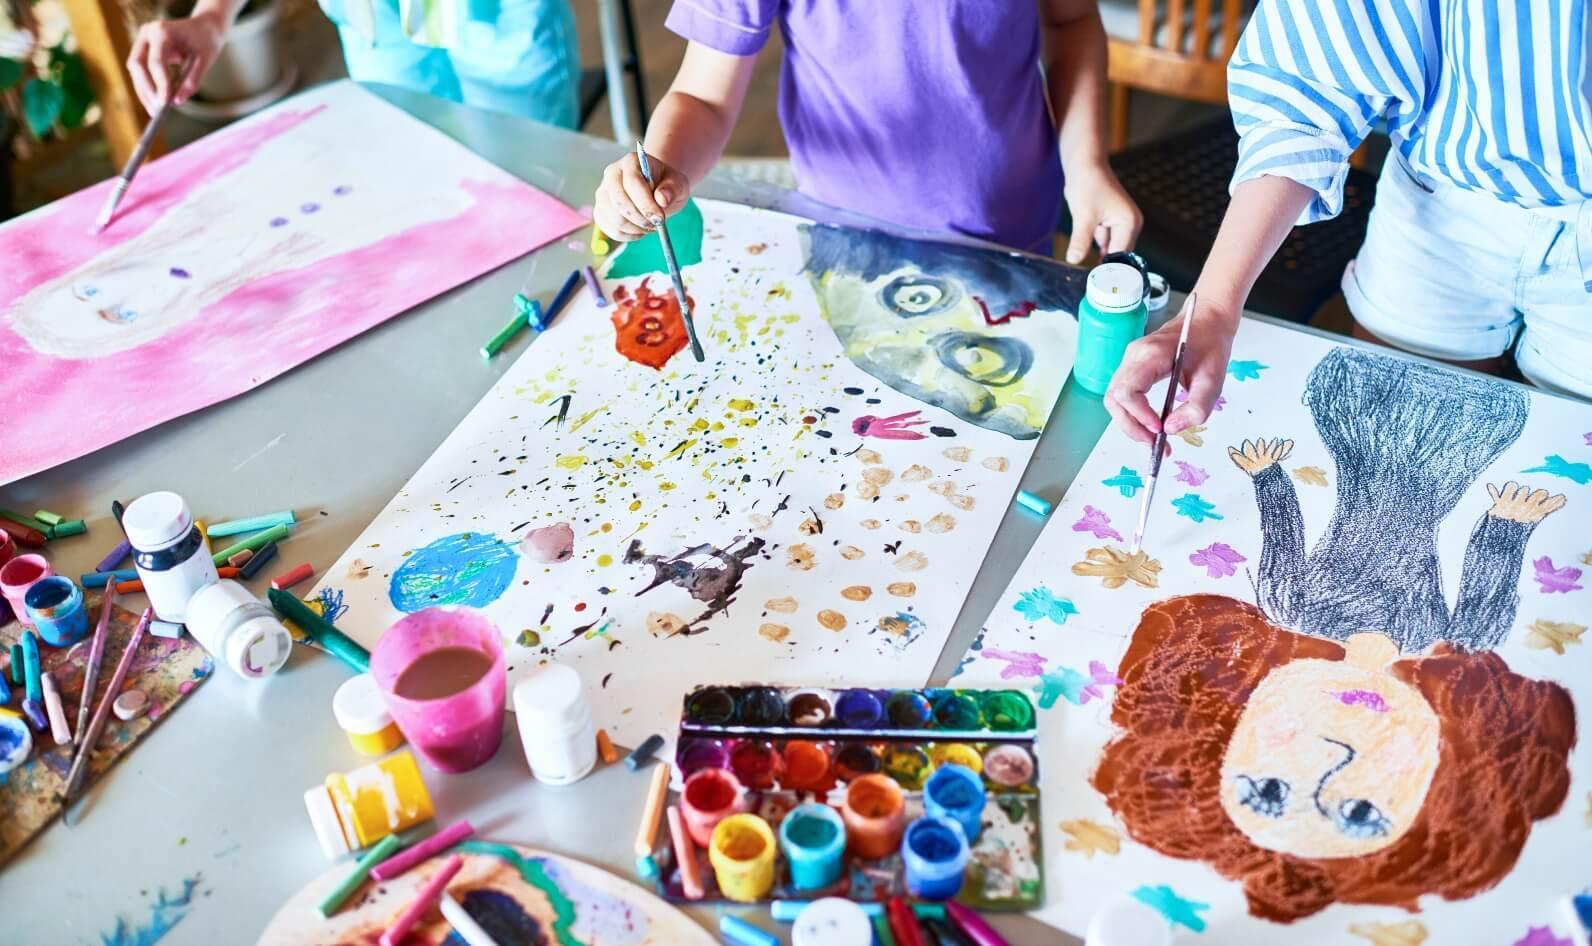 https://kids-galaxy.com.ua/wp-content/uploads/2020/05/unleashing-your-childs-inner-artist-hero.jpg